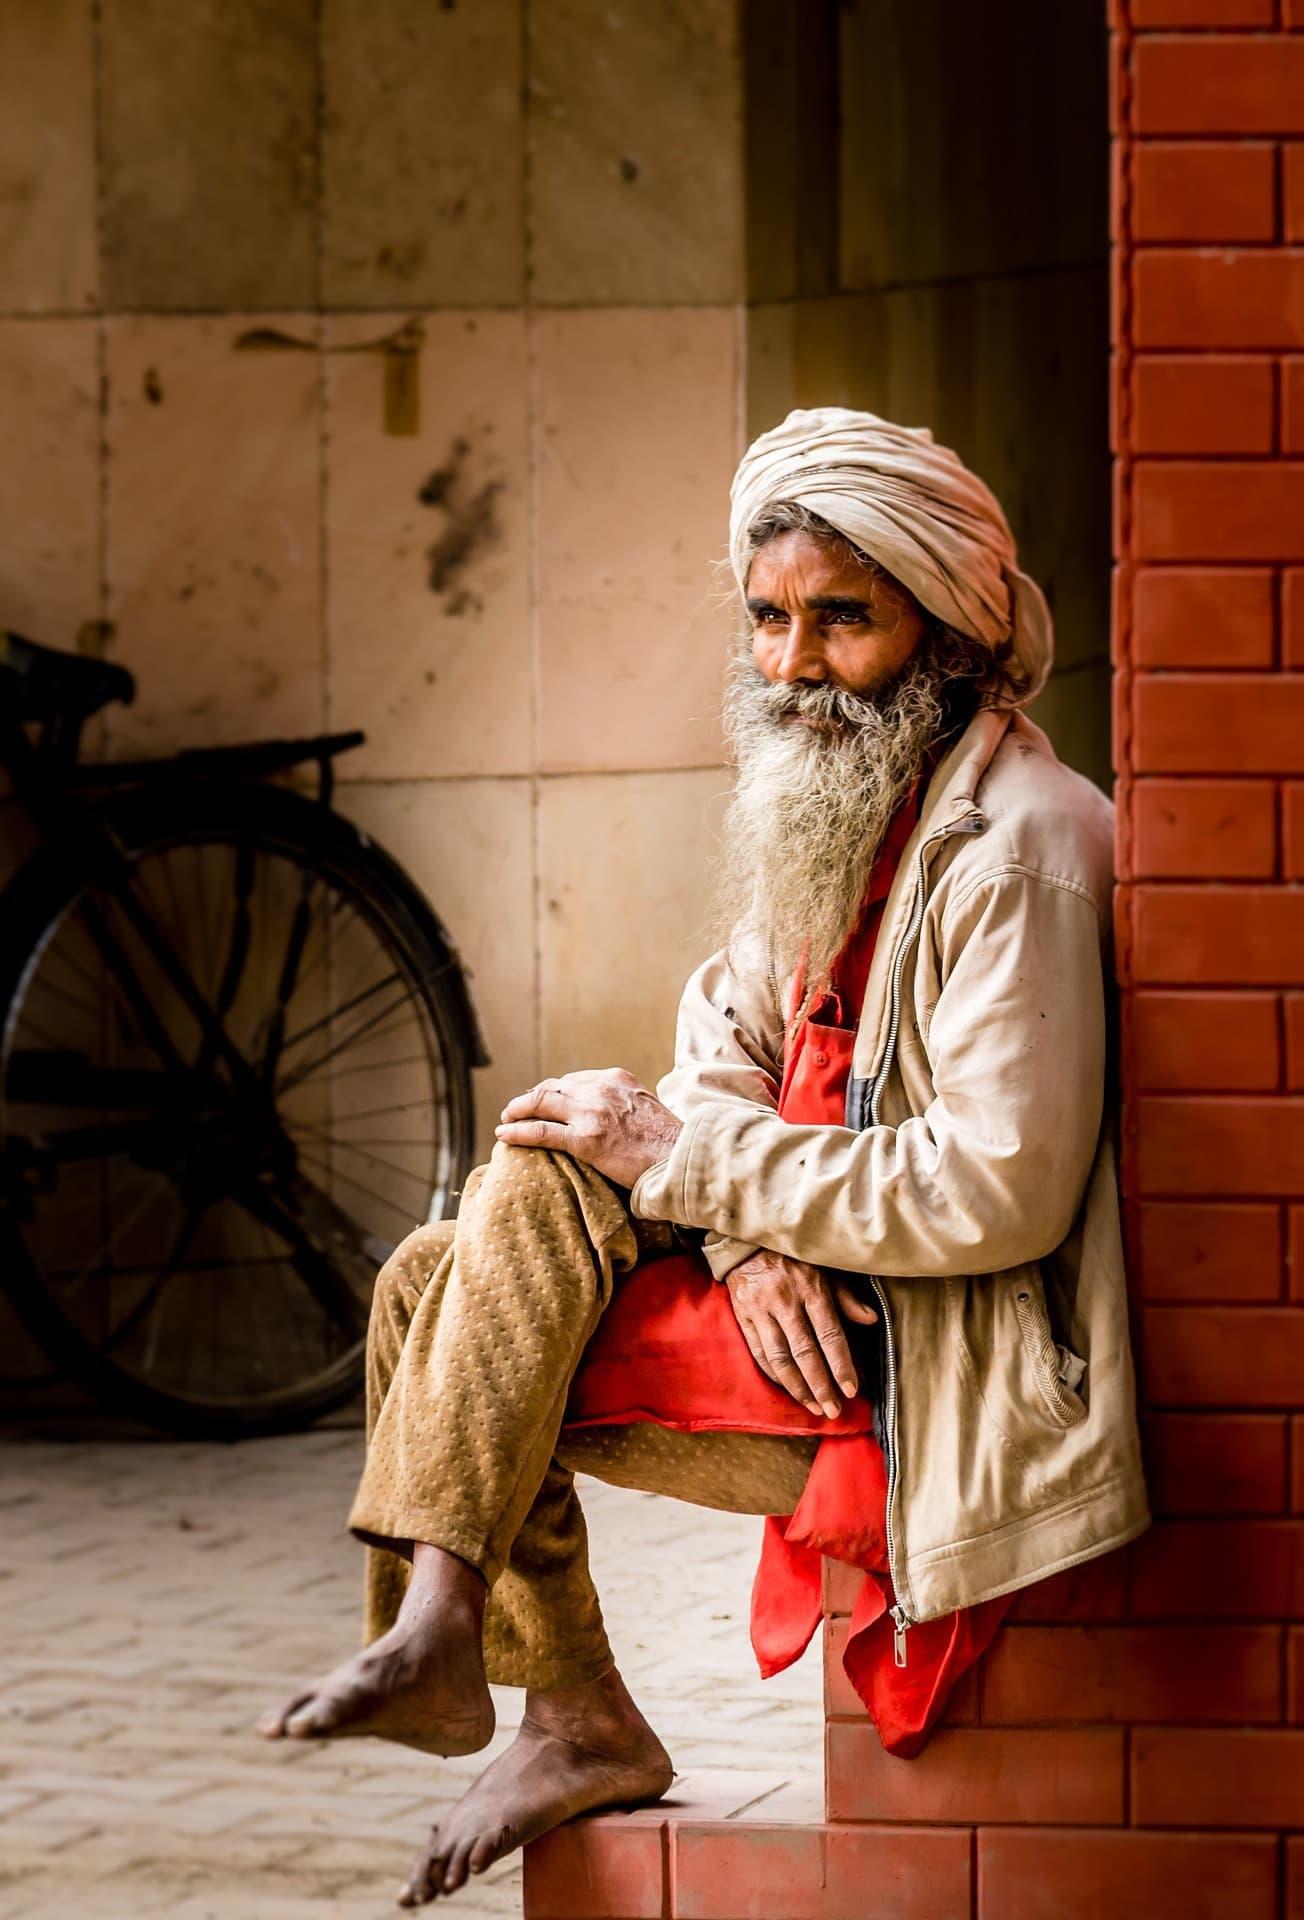 indians-1086437_1920